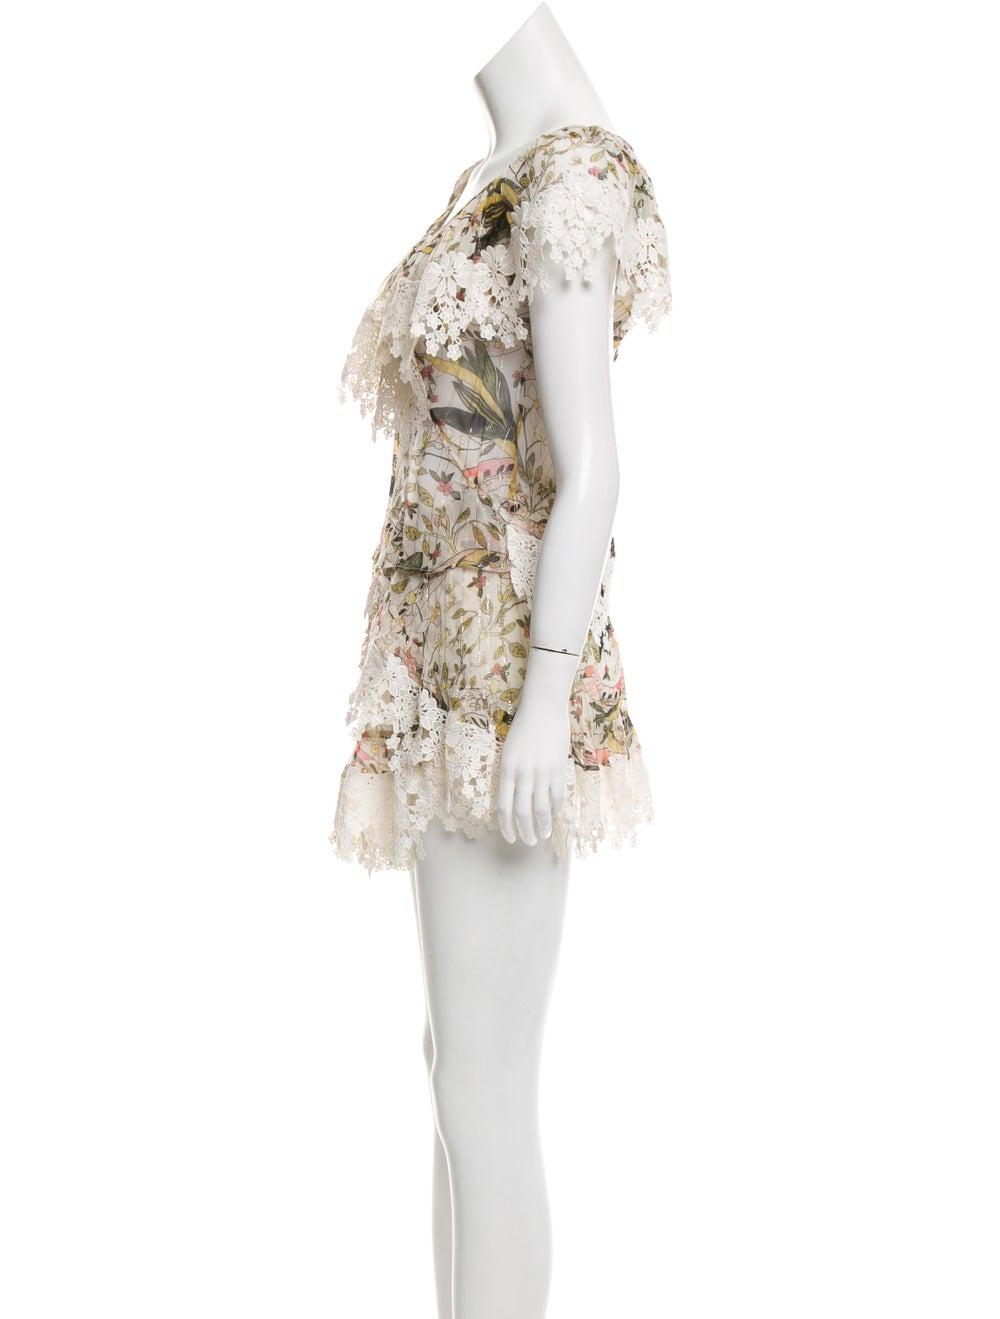 Zimmermann Floral Print Skirt Set - image 2